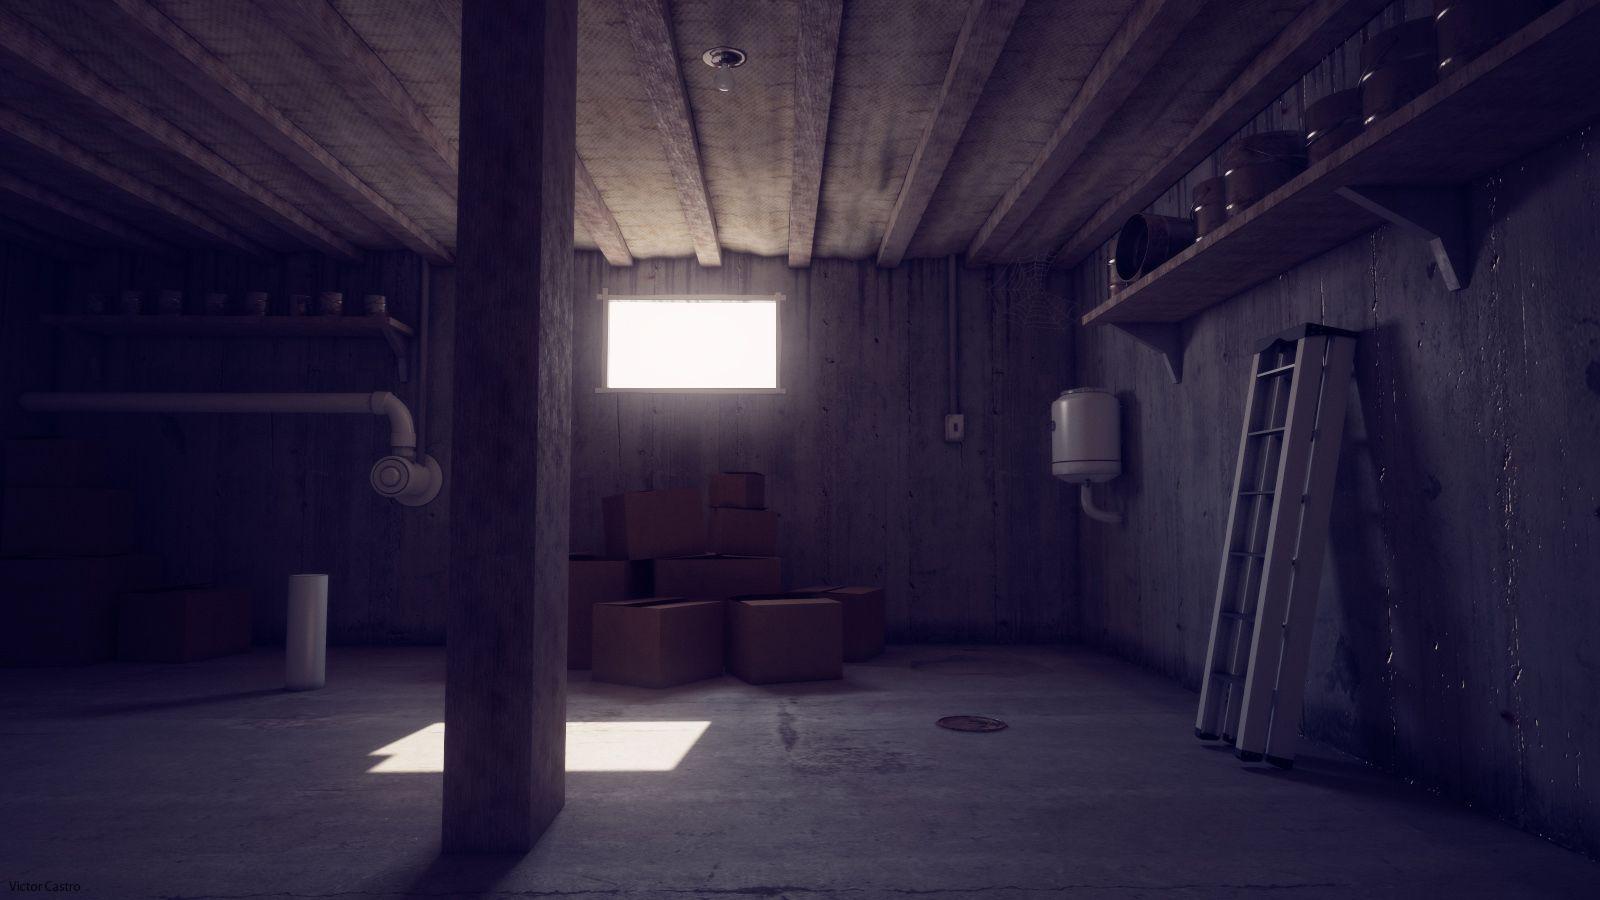 Basement Dark Google Search Dark Basement Anime Places Episode Interactive Backgrounds Anime wallpaper dark rooms hd